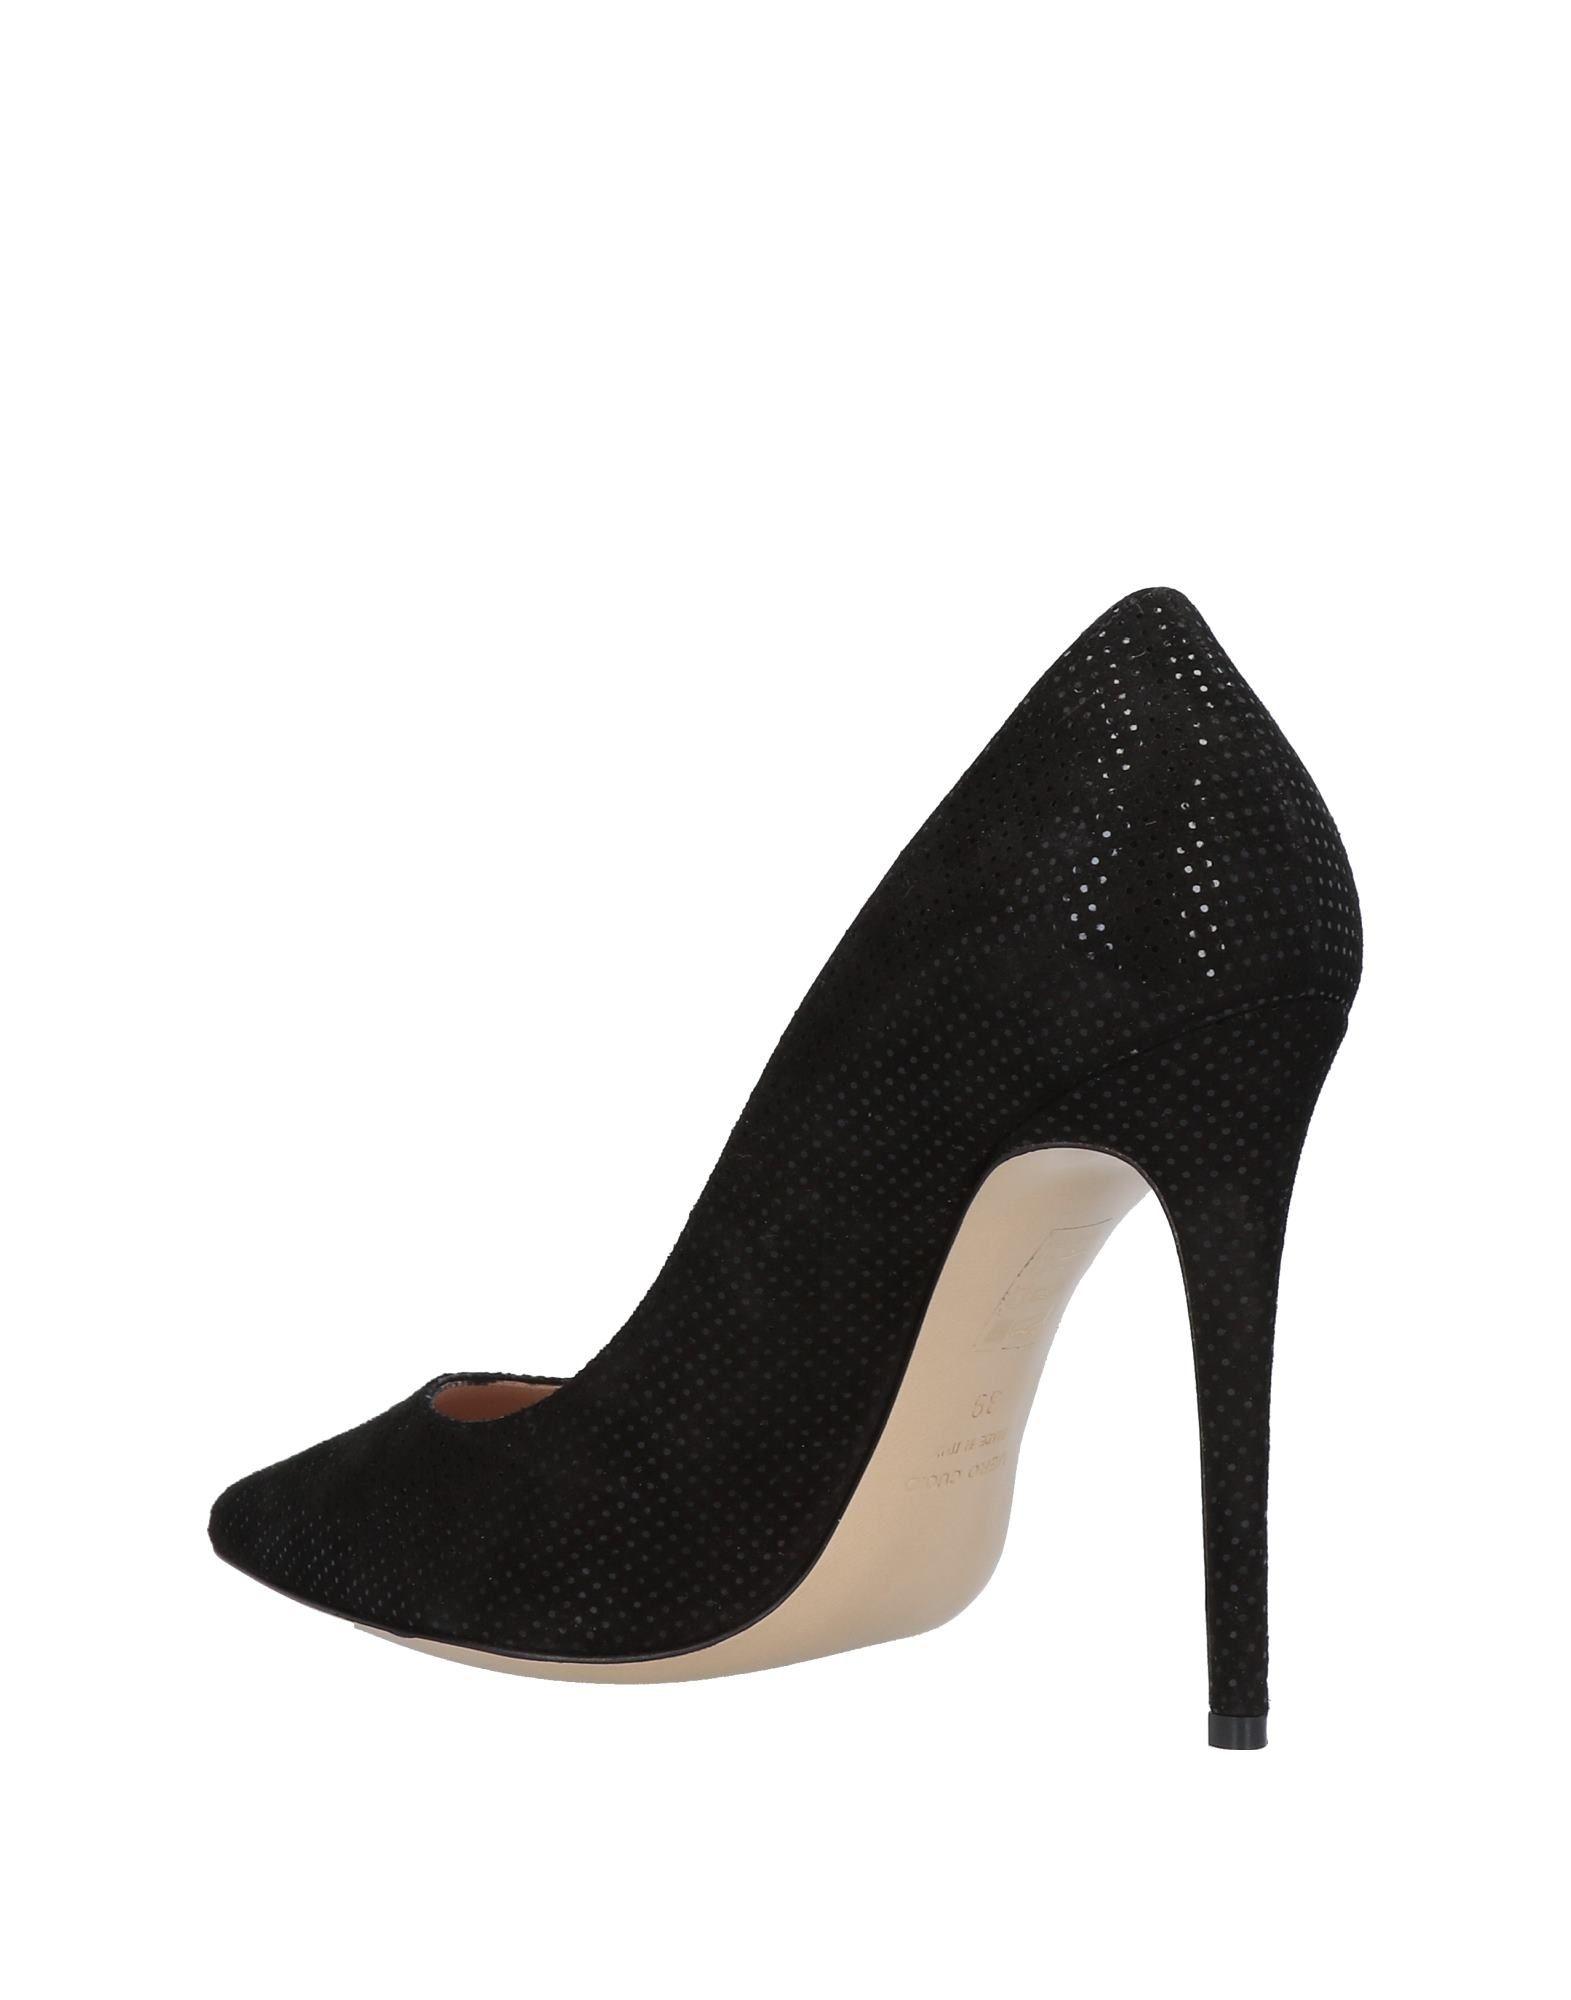 Stilvolle billige Schuhe Luciano Padovan Pumps Damen  11480218VV 11480218VV 11480218VV bf247f